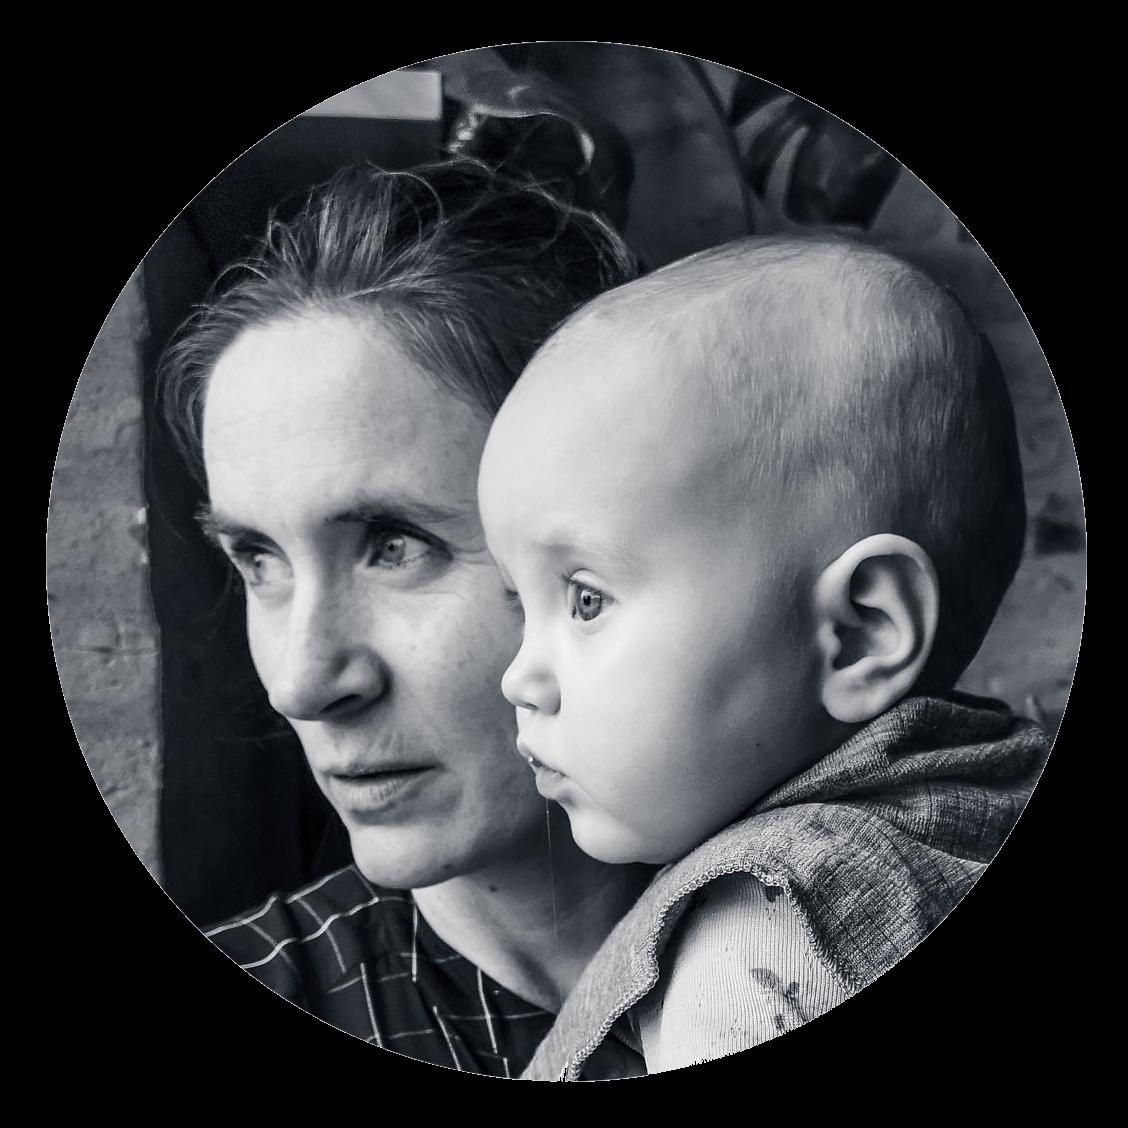 Fotograf Caroline Strømhylden, holder datteren